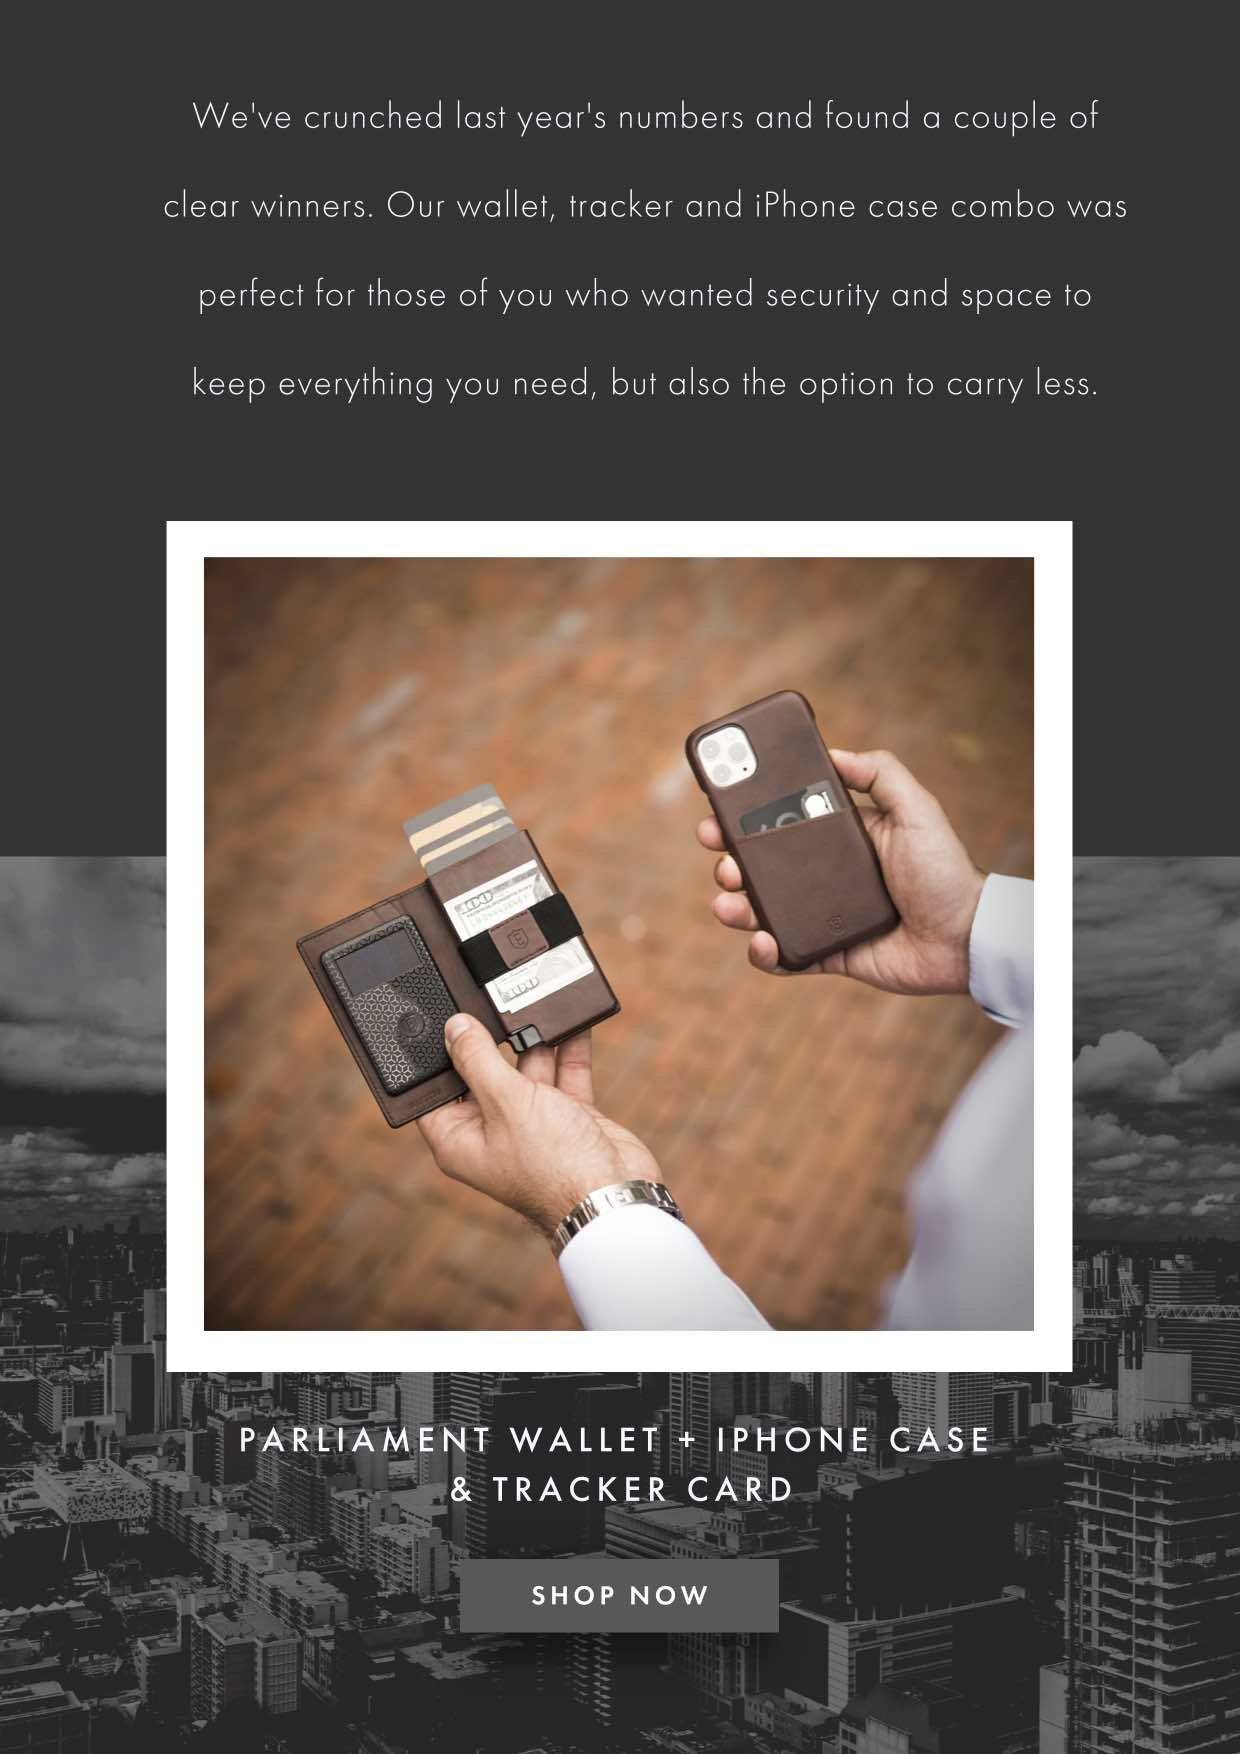 PARLIAMENT + TRACKER + IPHONE CASE